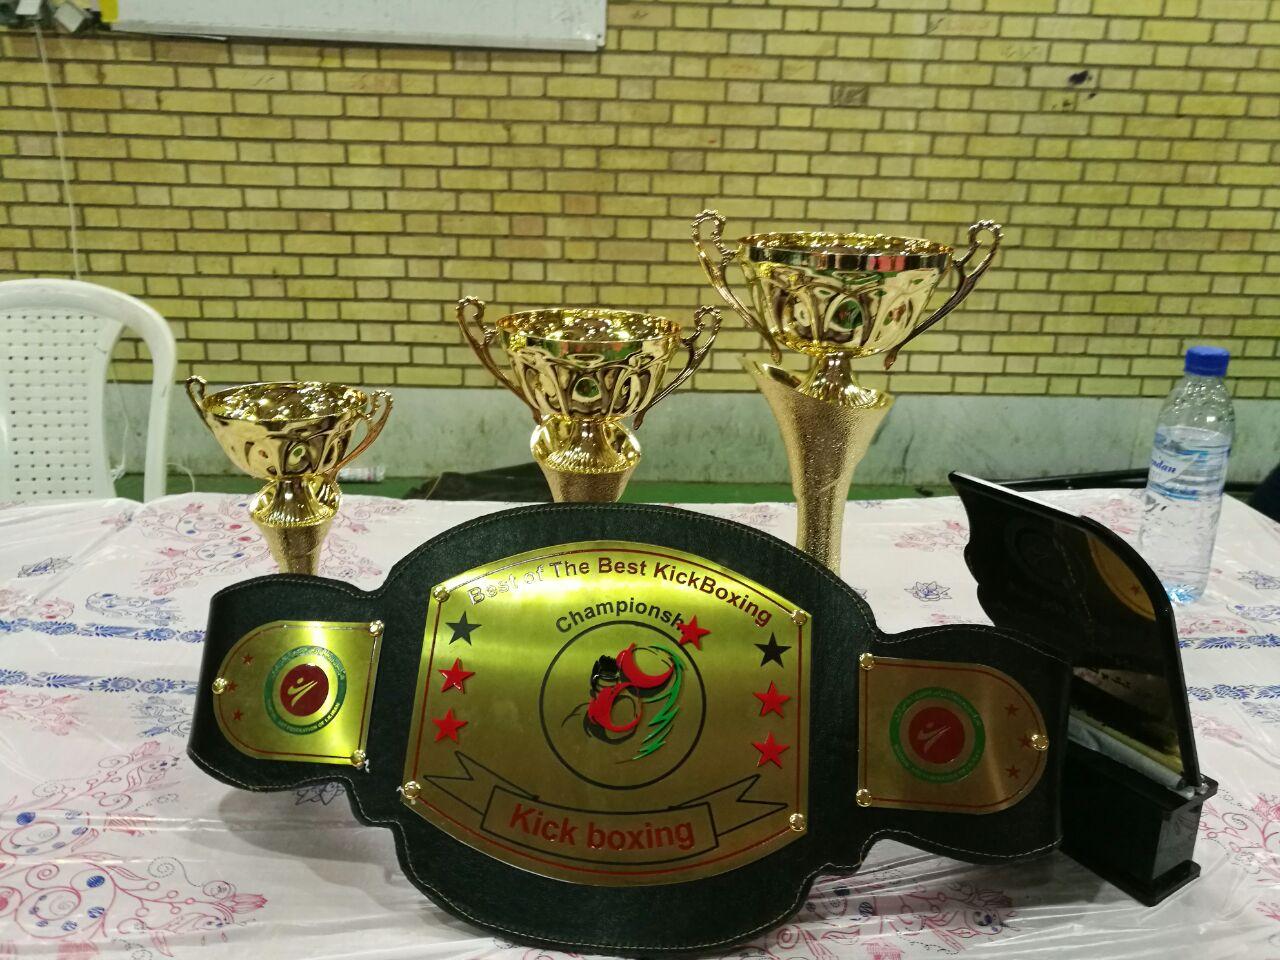 قهرماني تيم هييت كيك بوكسران شهرستان جم در مسابقات جام ولايت استان بوشهر